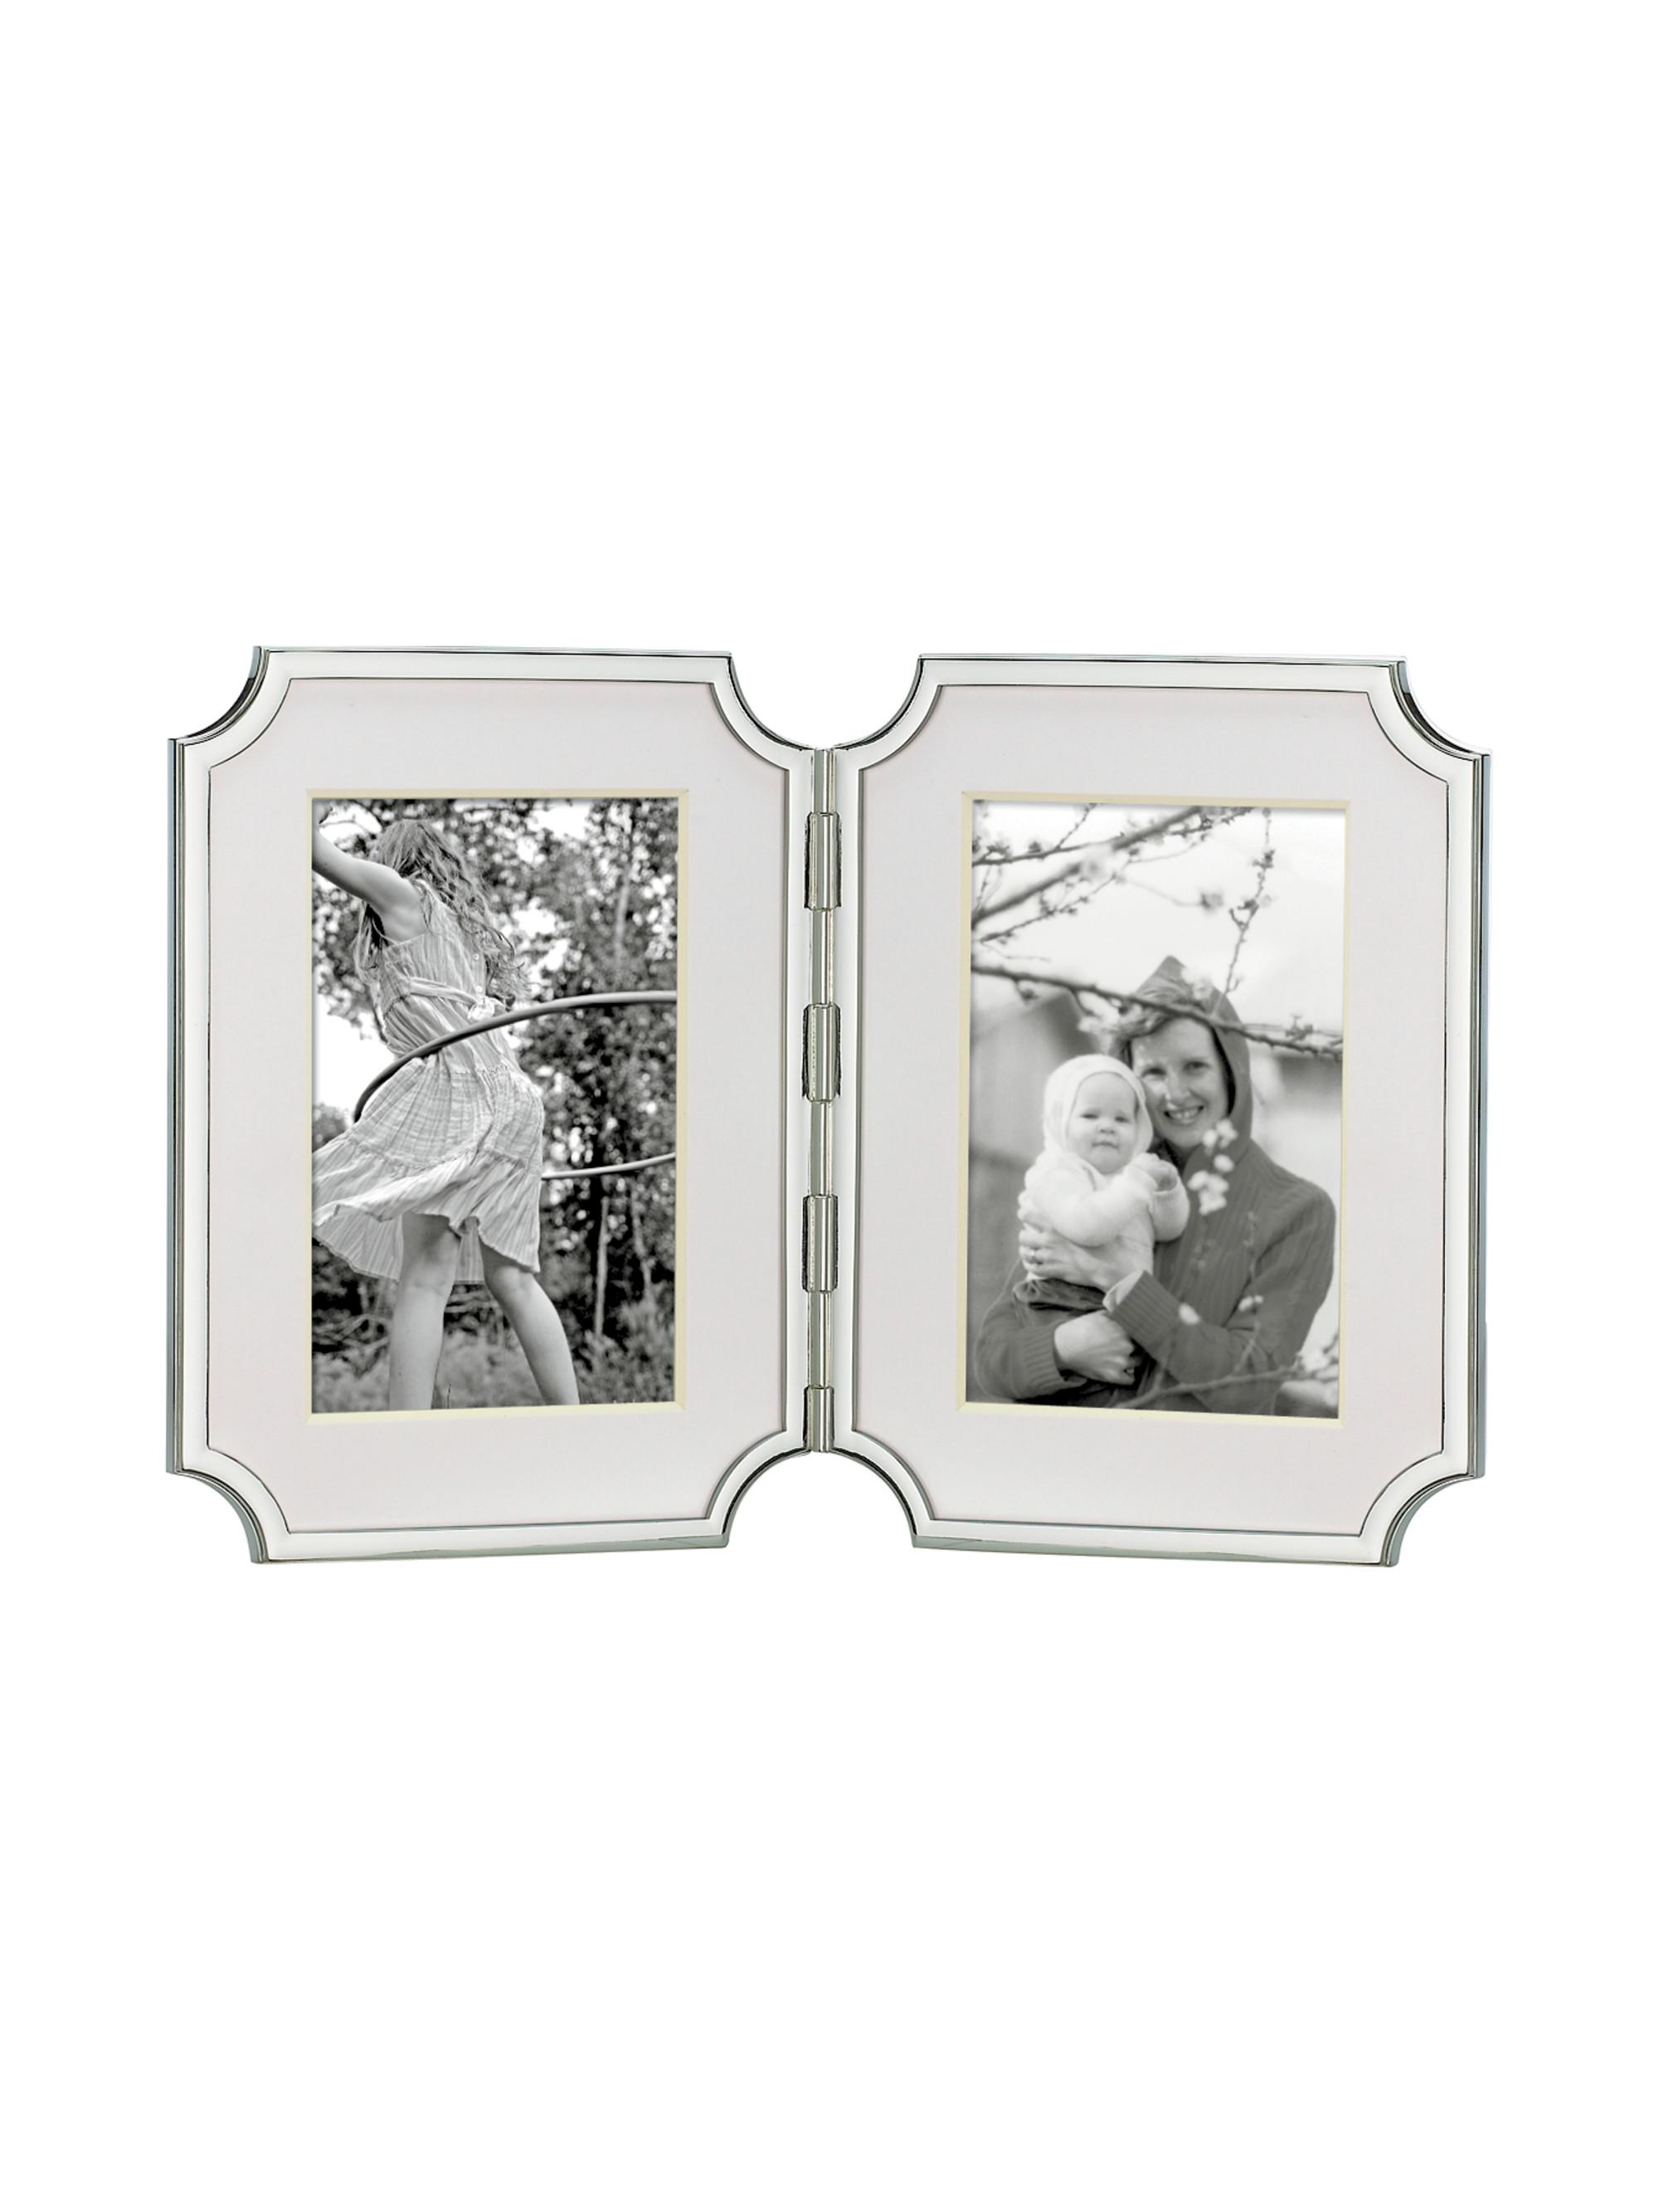 kate spade wedding invitation frame wedding invitation sample on kate spade wedding invitation frame